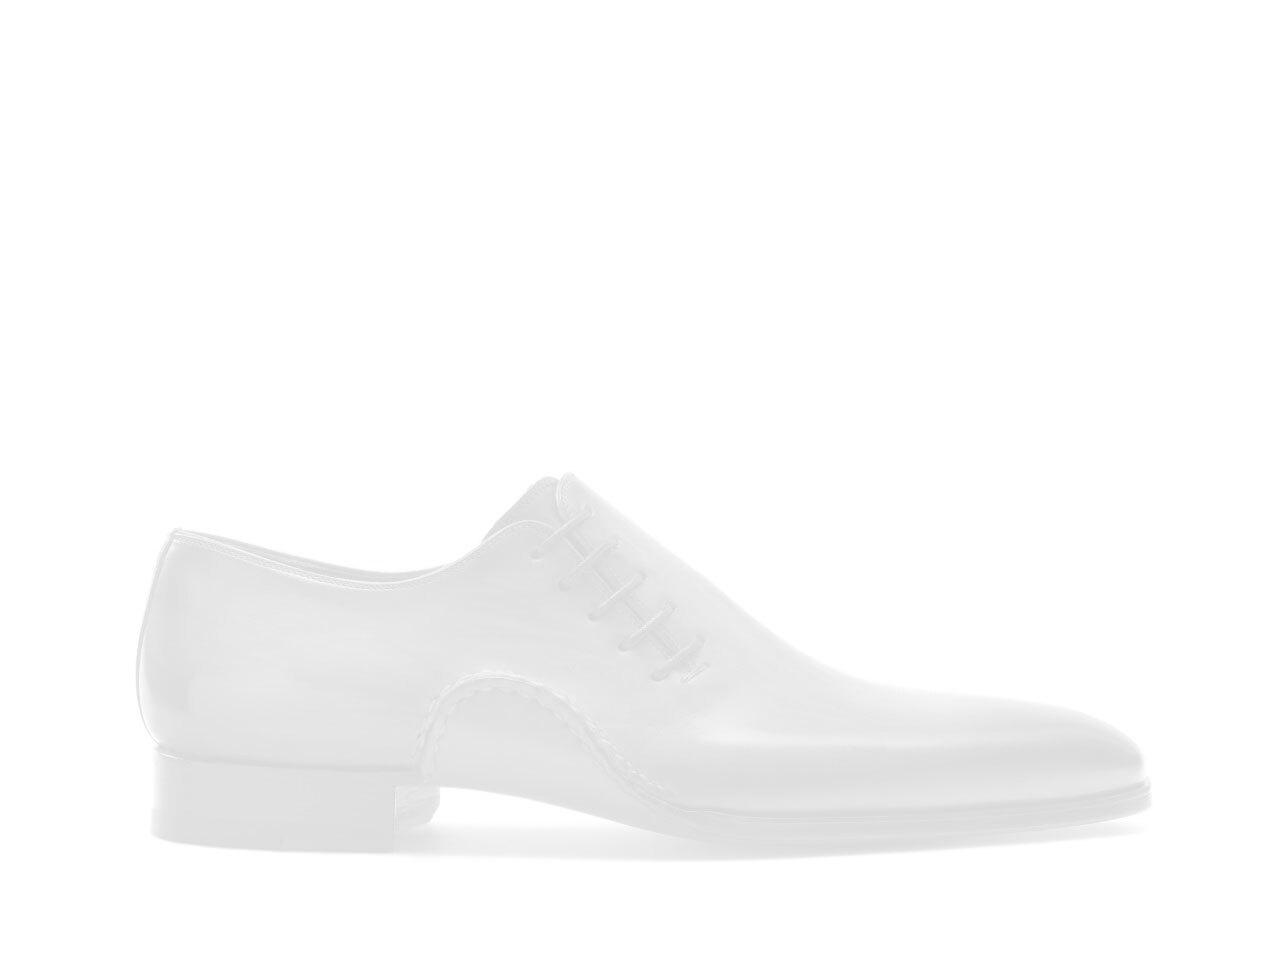 Sole of the Magnanni Cruz Black Men's Oxford Shoes